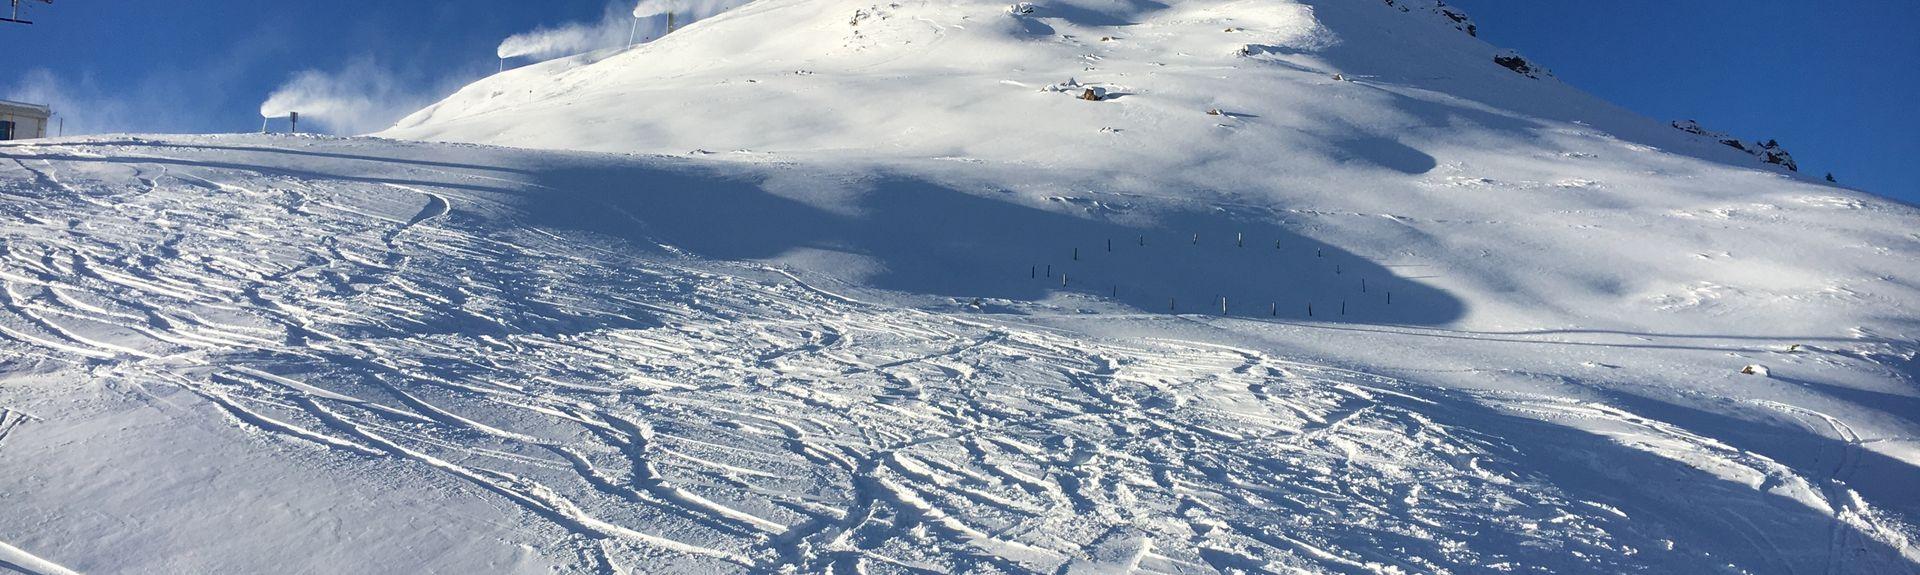 Waidring - Steinplatte skidlift, Waidring, Tyrolen, Österrike